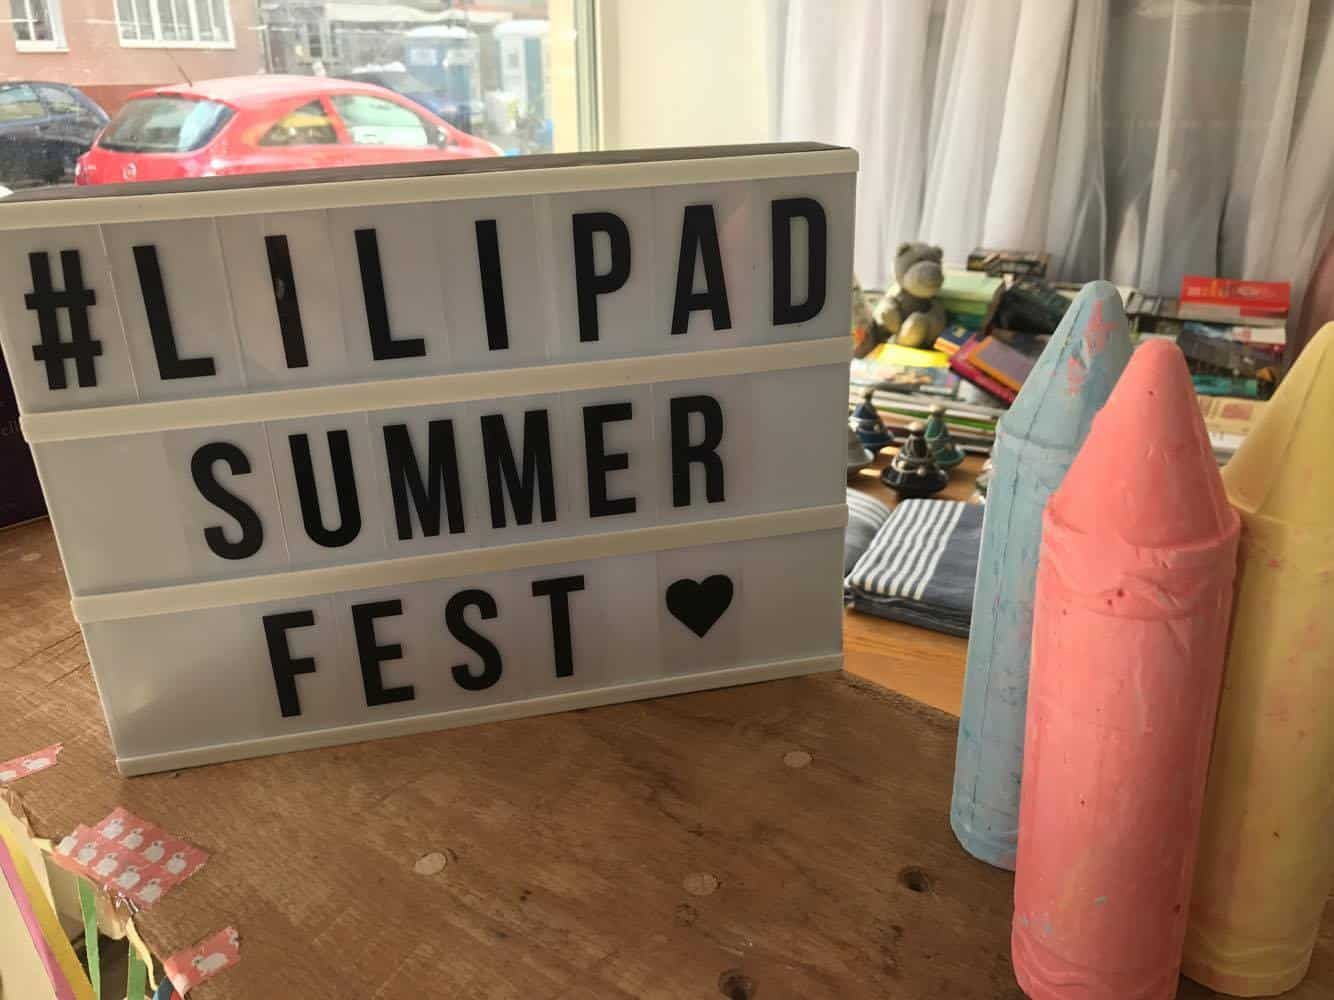 Lilipad Charity Summer Fest 4